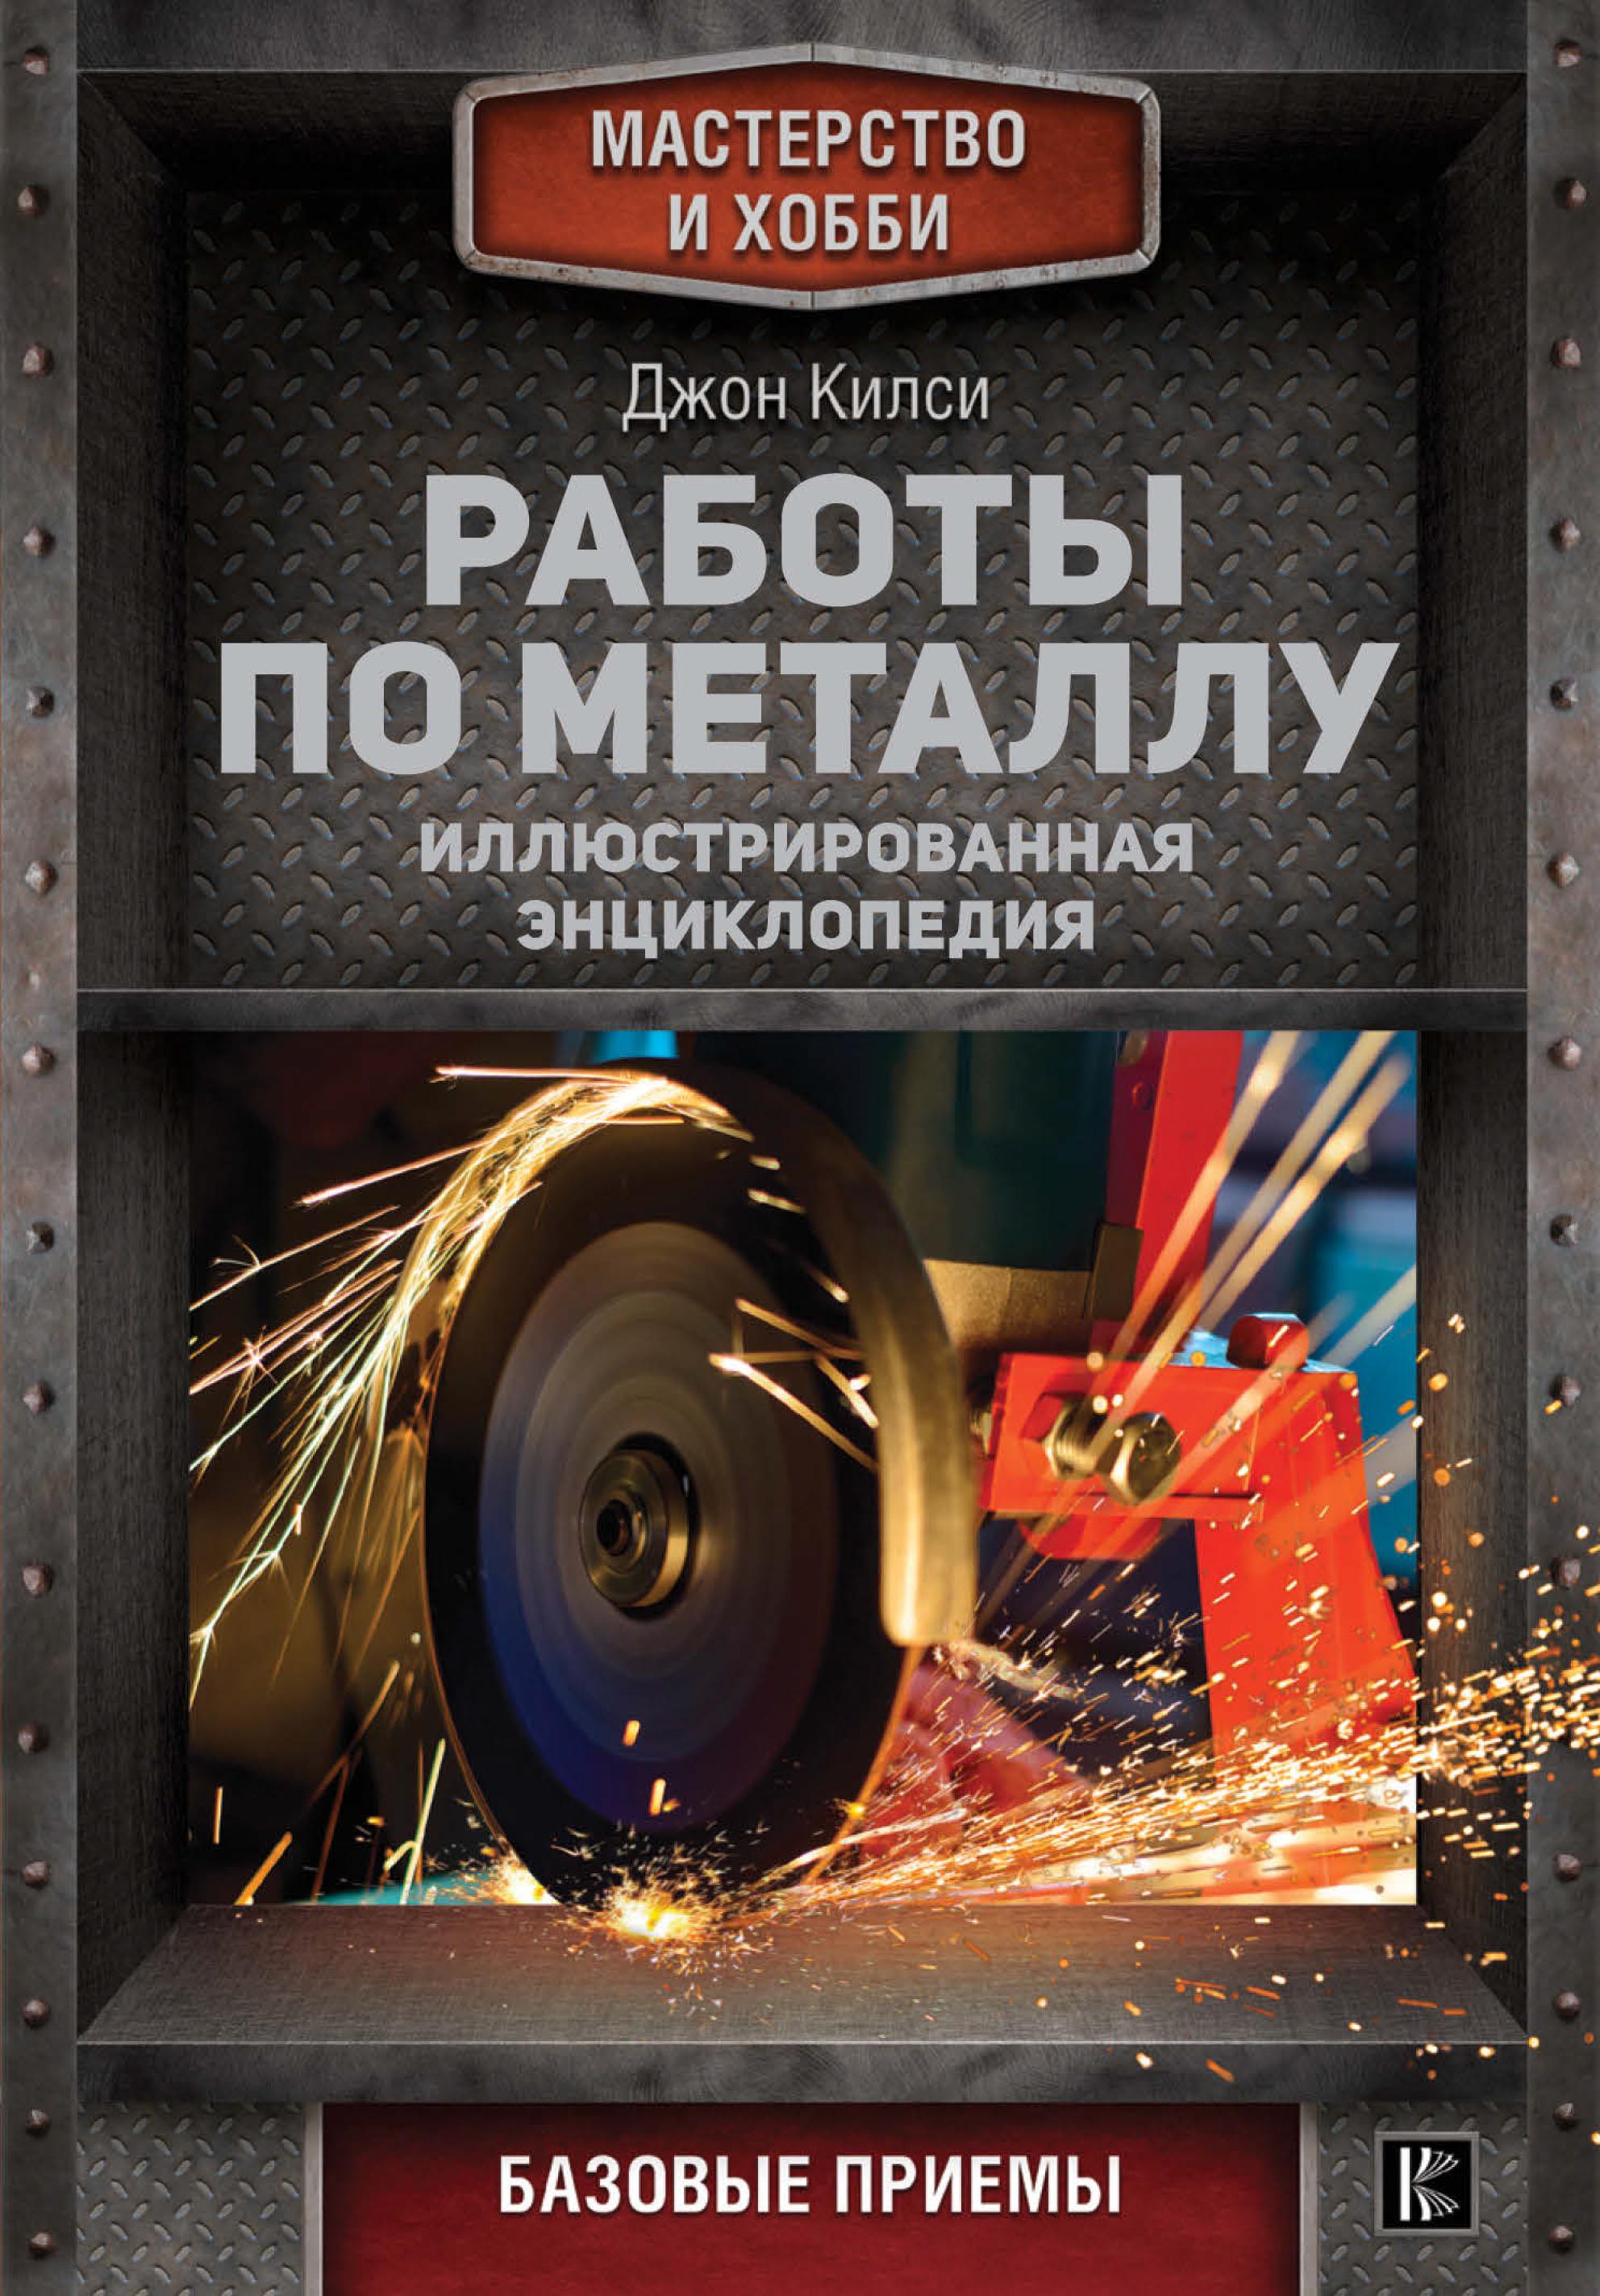 Работы по металлу